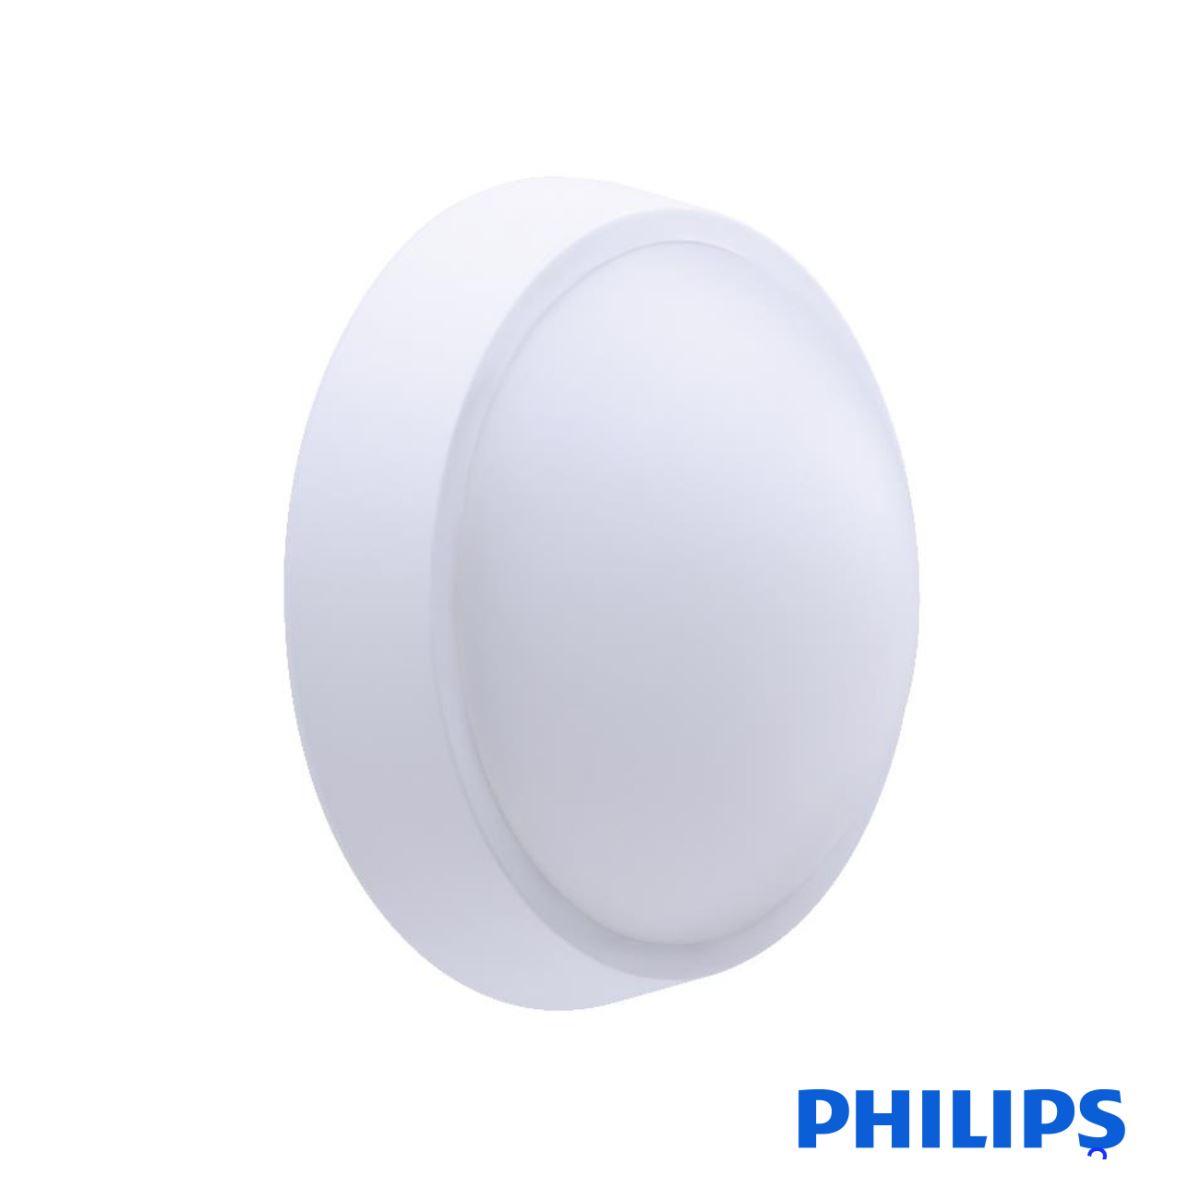 Đèn ốp trần Philips 20W IP65